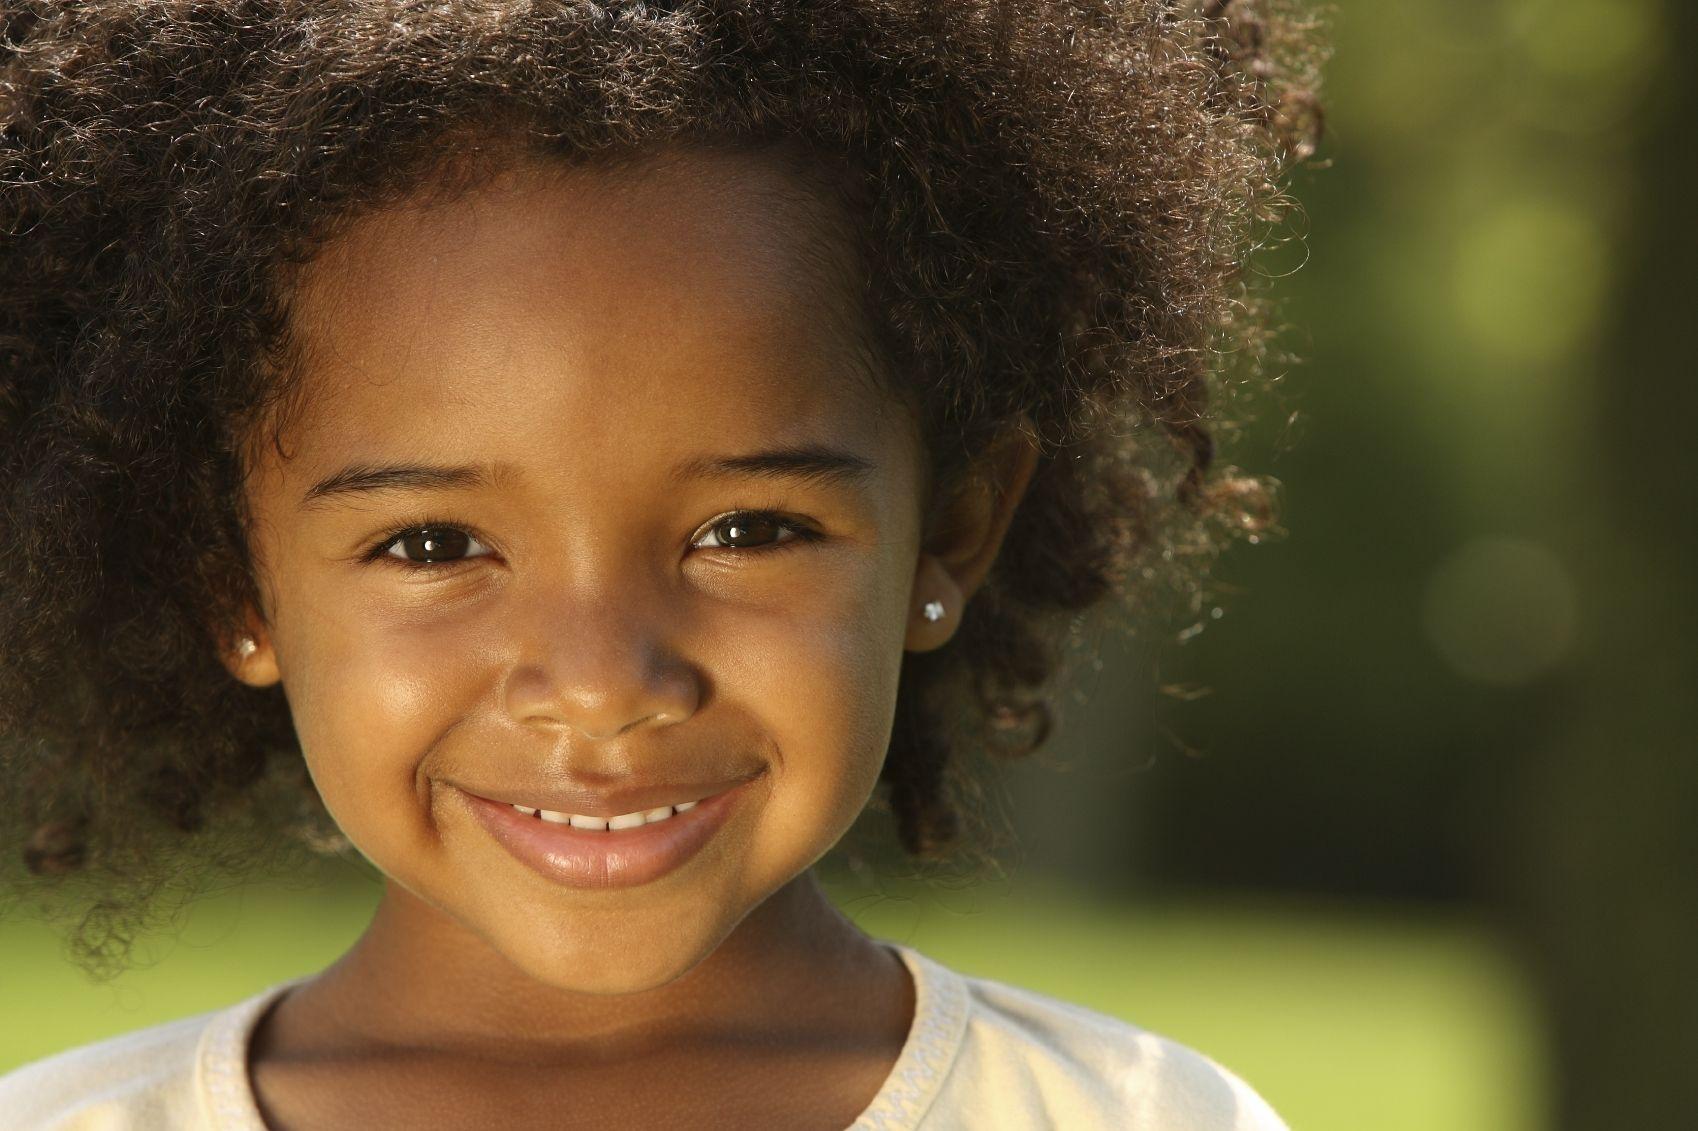 Black Children Hairstyles 2 Jpg 1698 215 1131 Things To